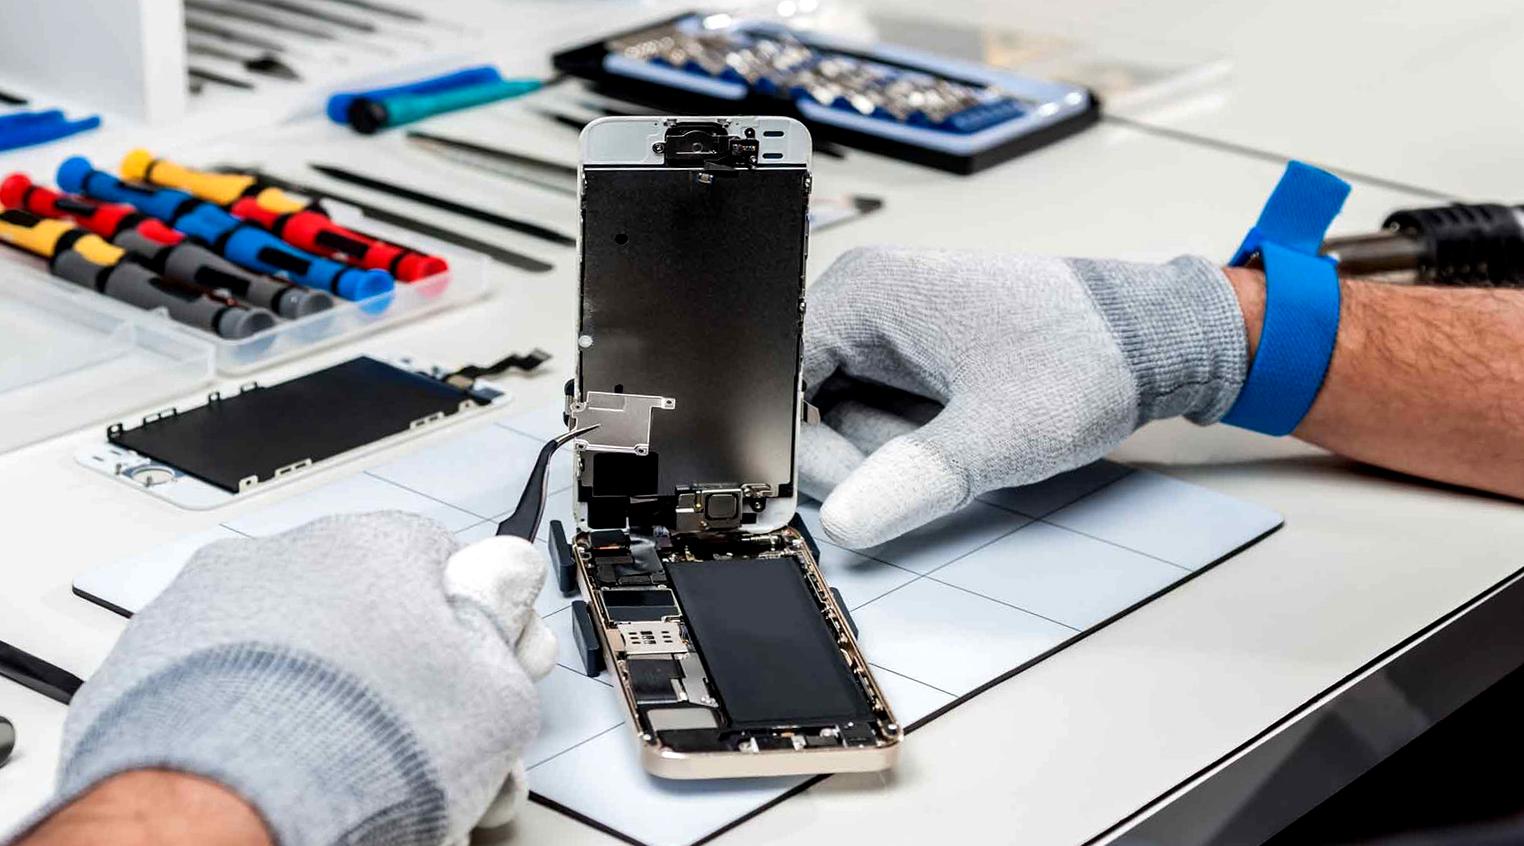 https://akkauntservis.ru/images/Apple/iphone/remont%20iphone.jpg